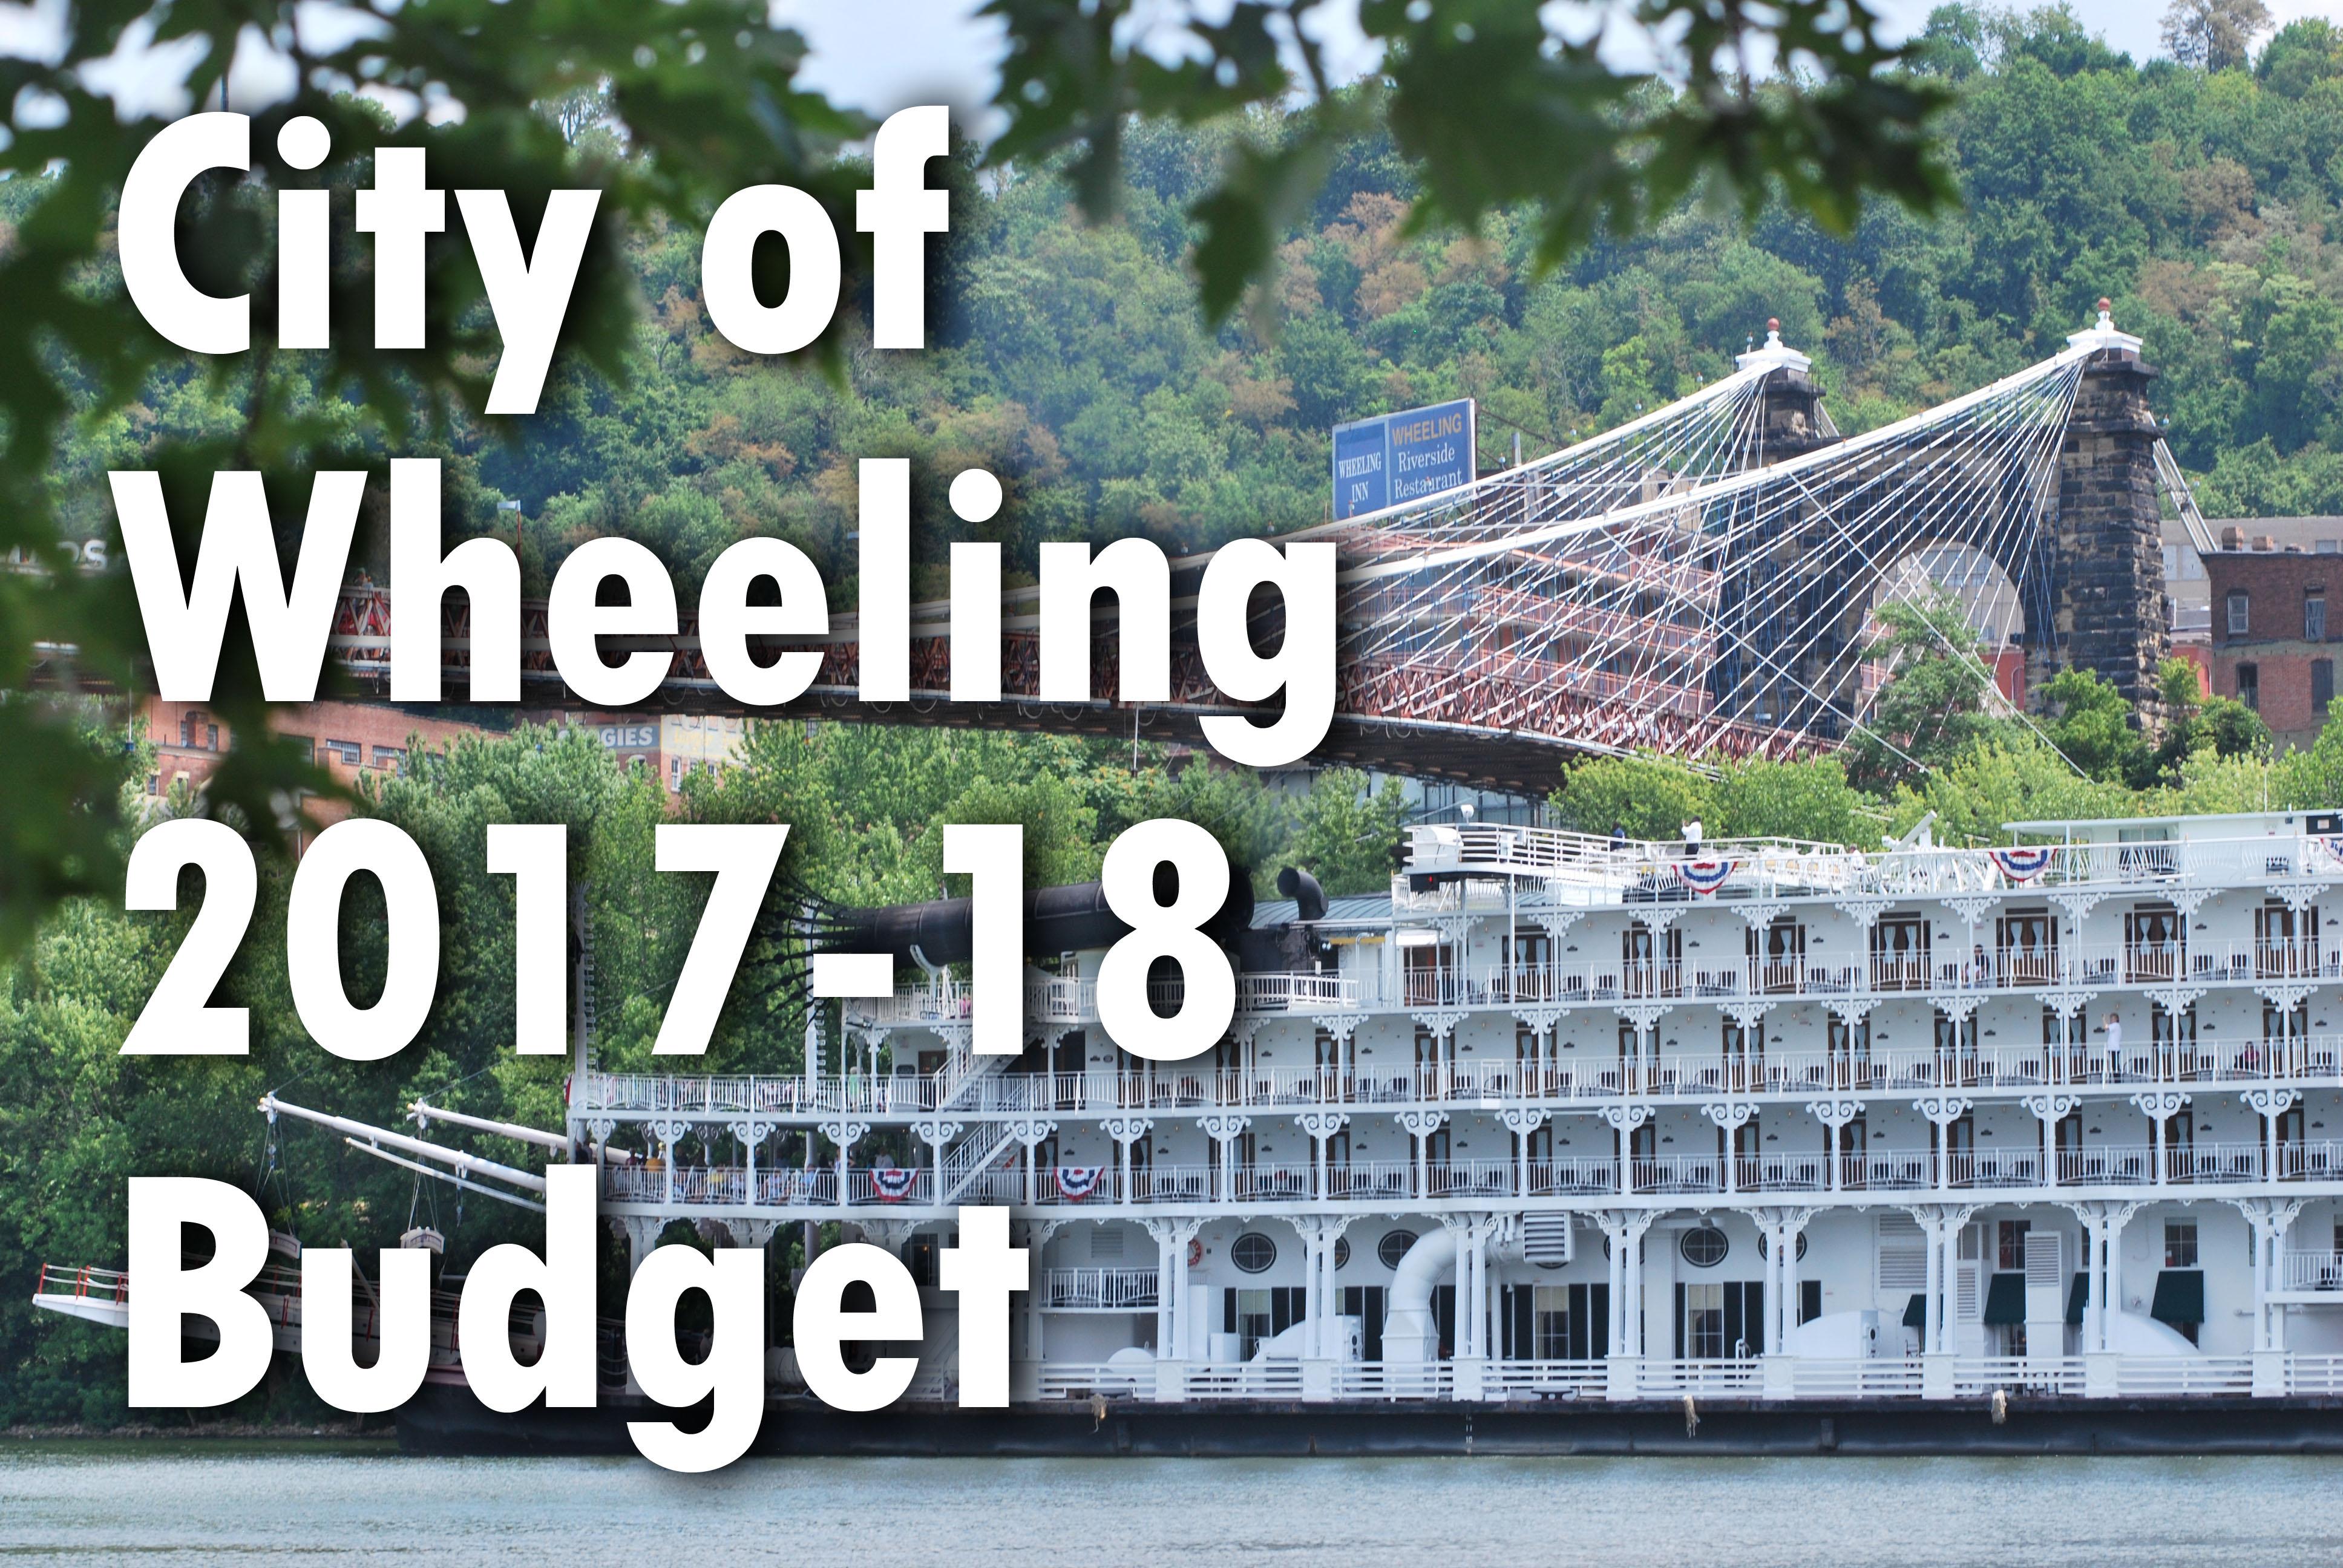 Wheeling 2017-18 Budget